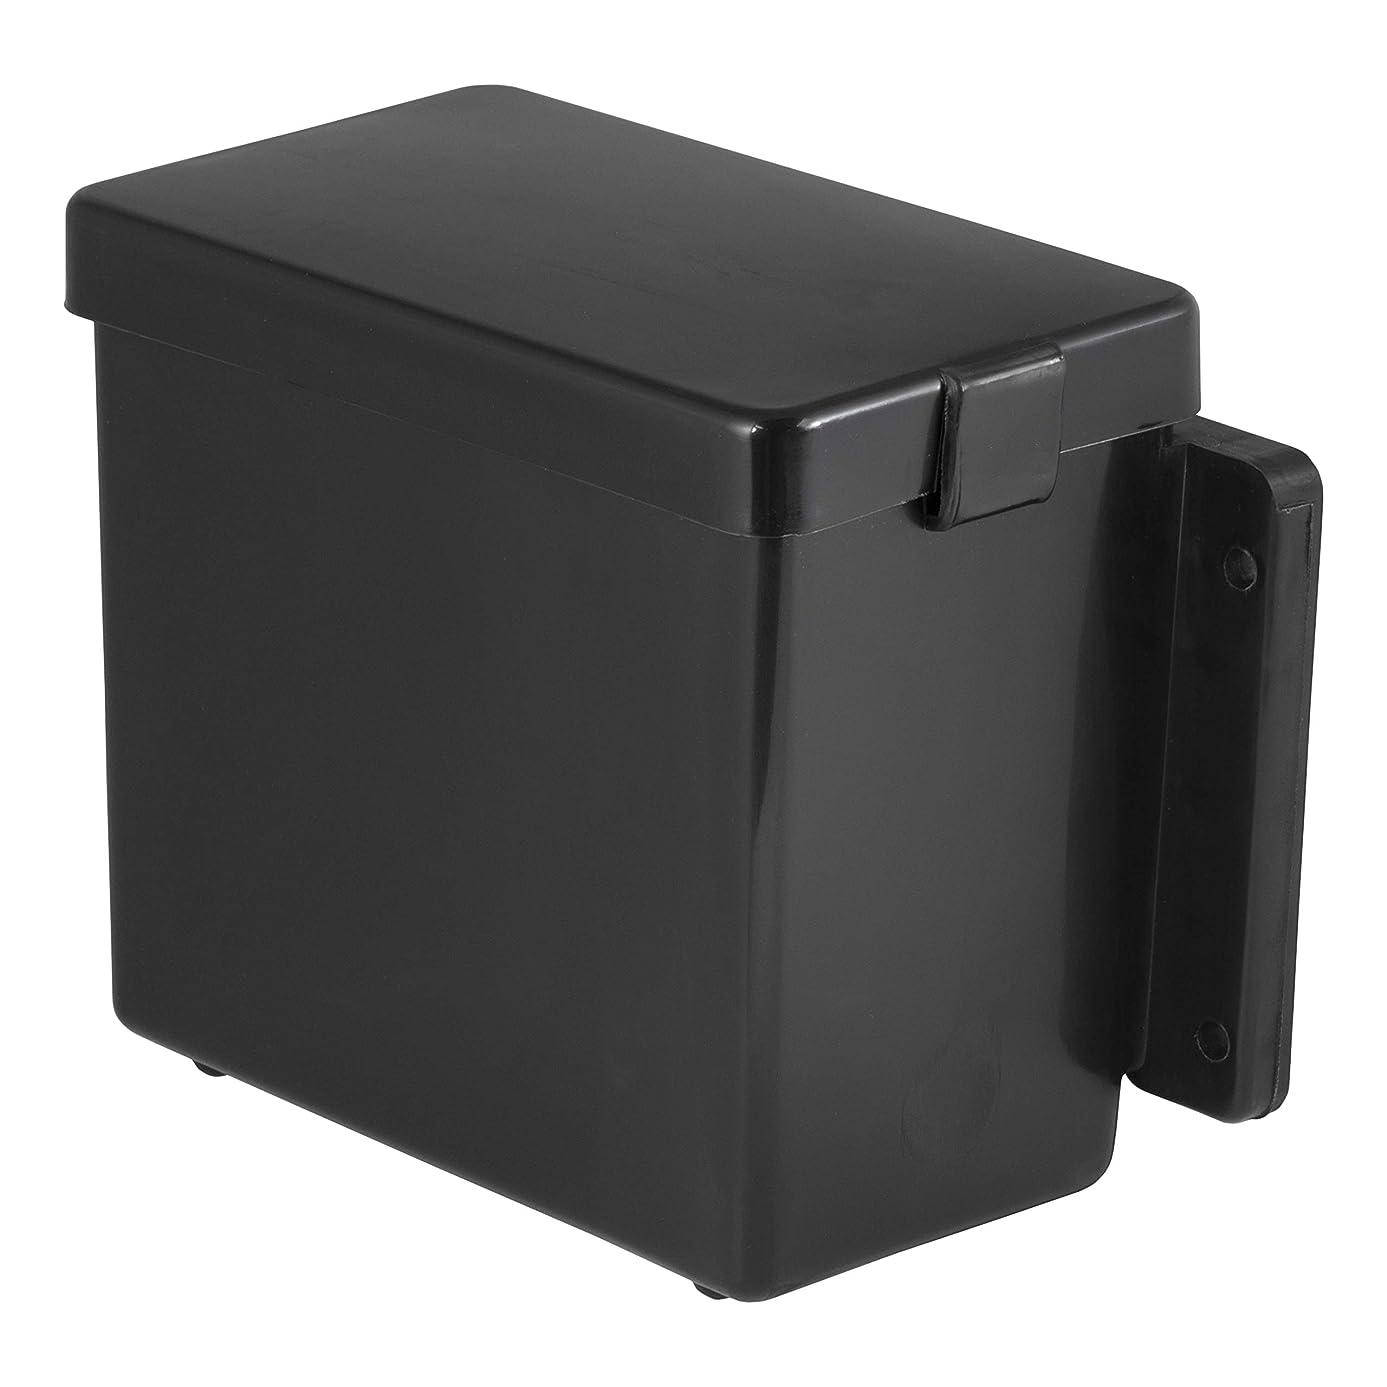 CURT 52022 6-Inch x 5-1/2-Inch x 3-1/4-Inch Lockable Trailer Breakaway Battery Case